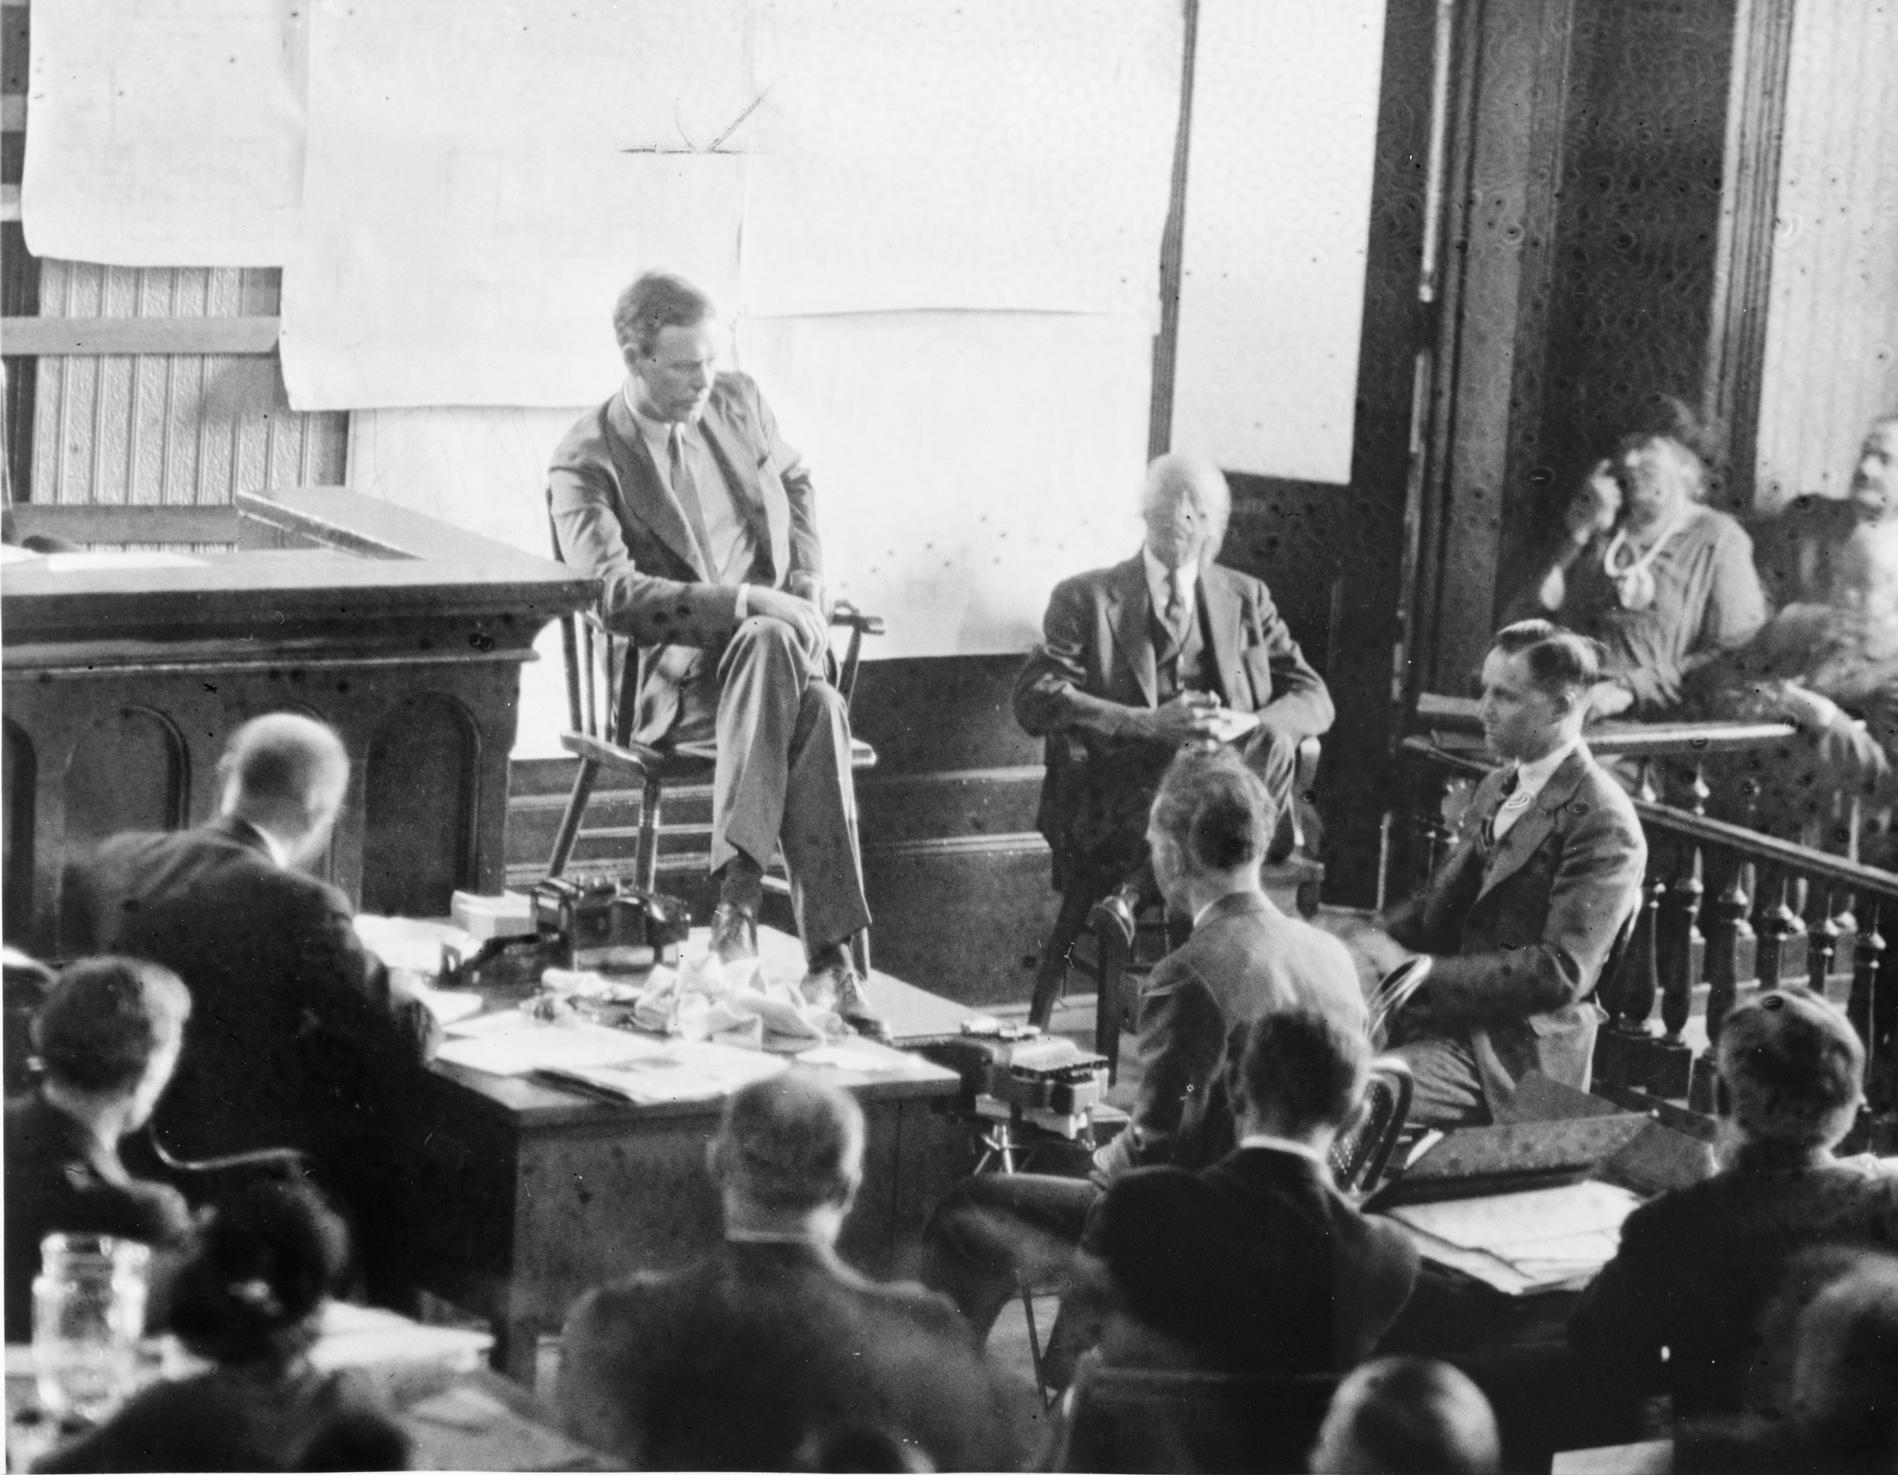 lindbergh testifying